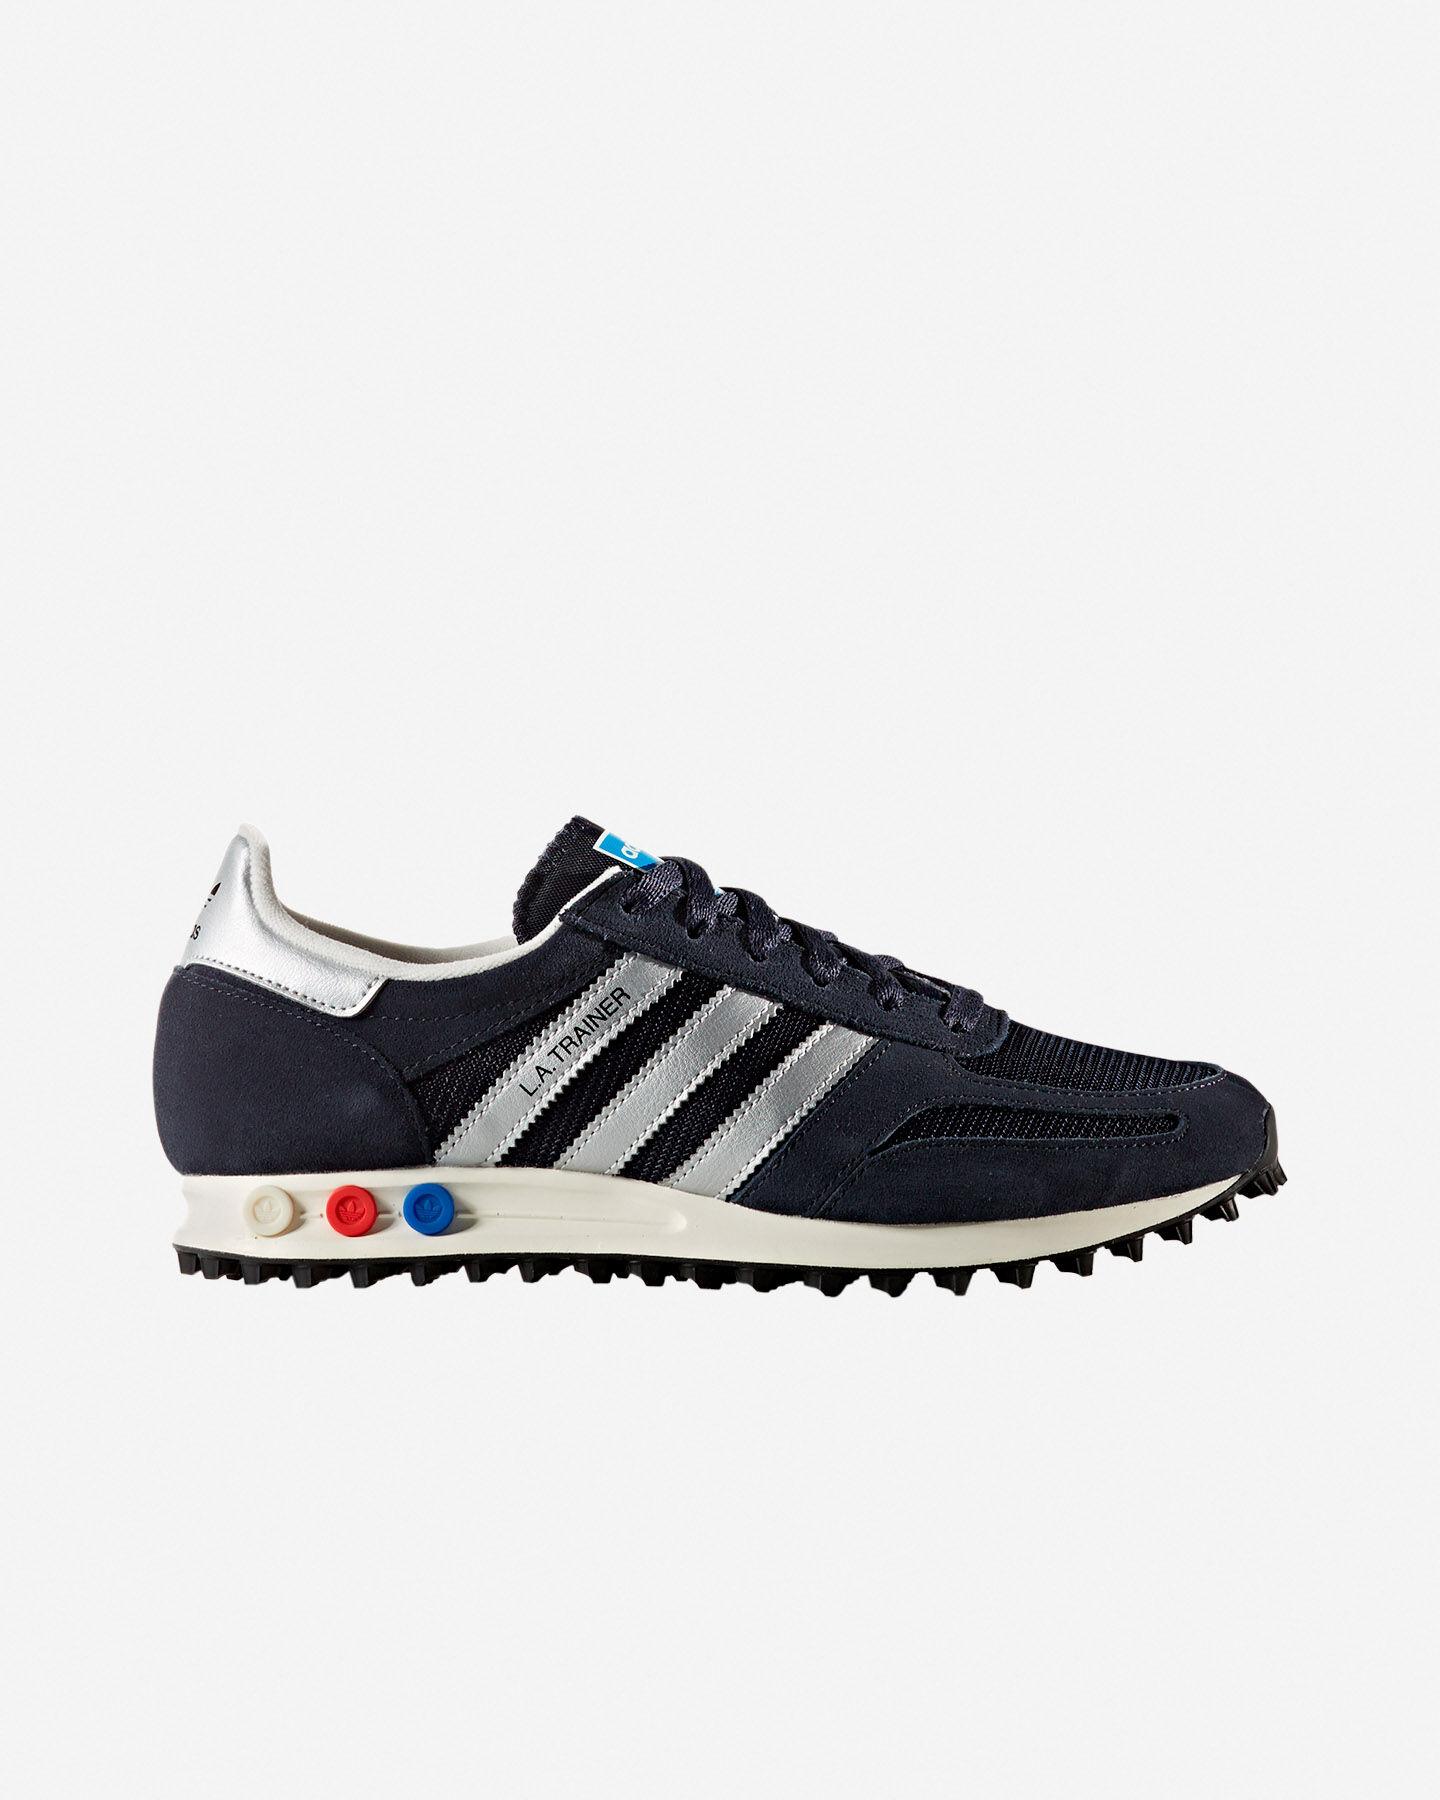 La Su Trainer Adidas Sneakers By9323 Scarpe Sport Og Cisalfa BUYwqx ... 3286f67c95d